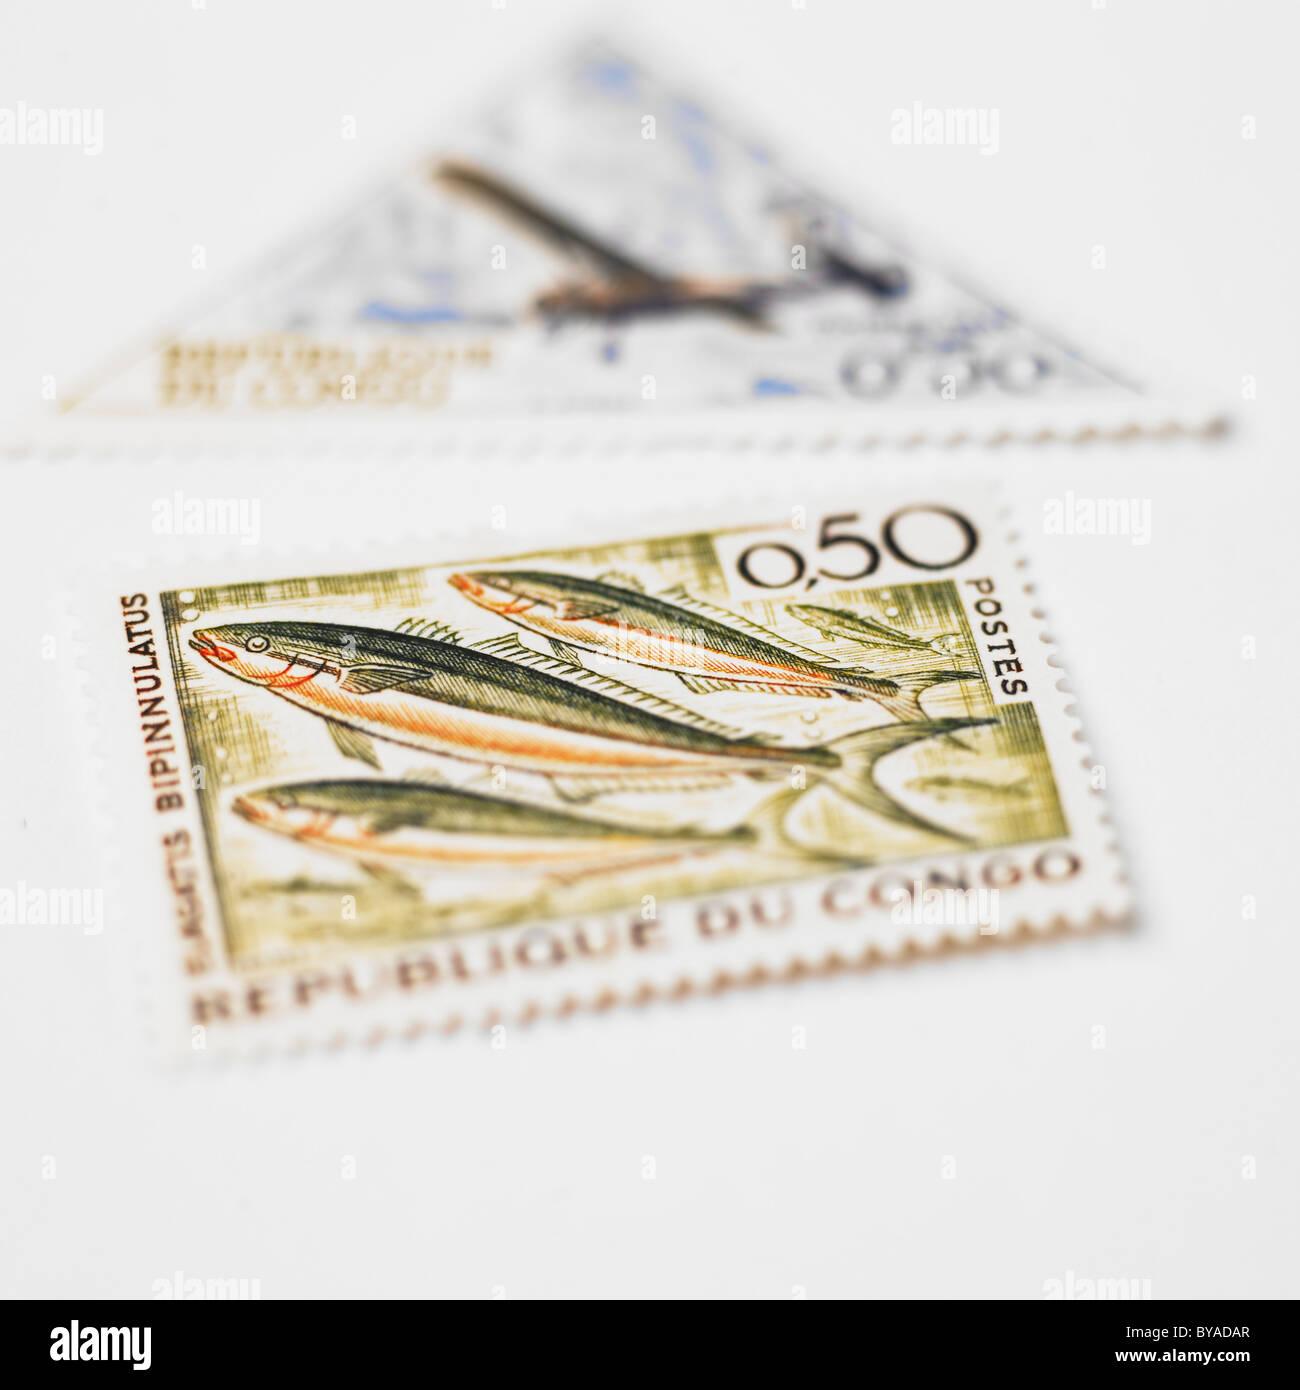 Republic Of Congo Postage Stamp, Elagatis bipinnulata - Stock Image